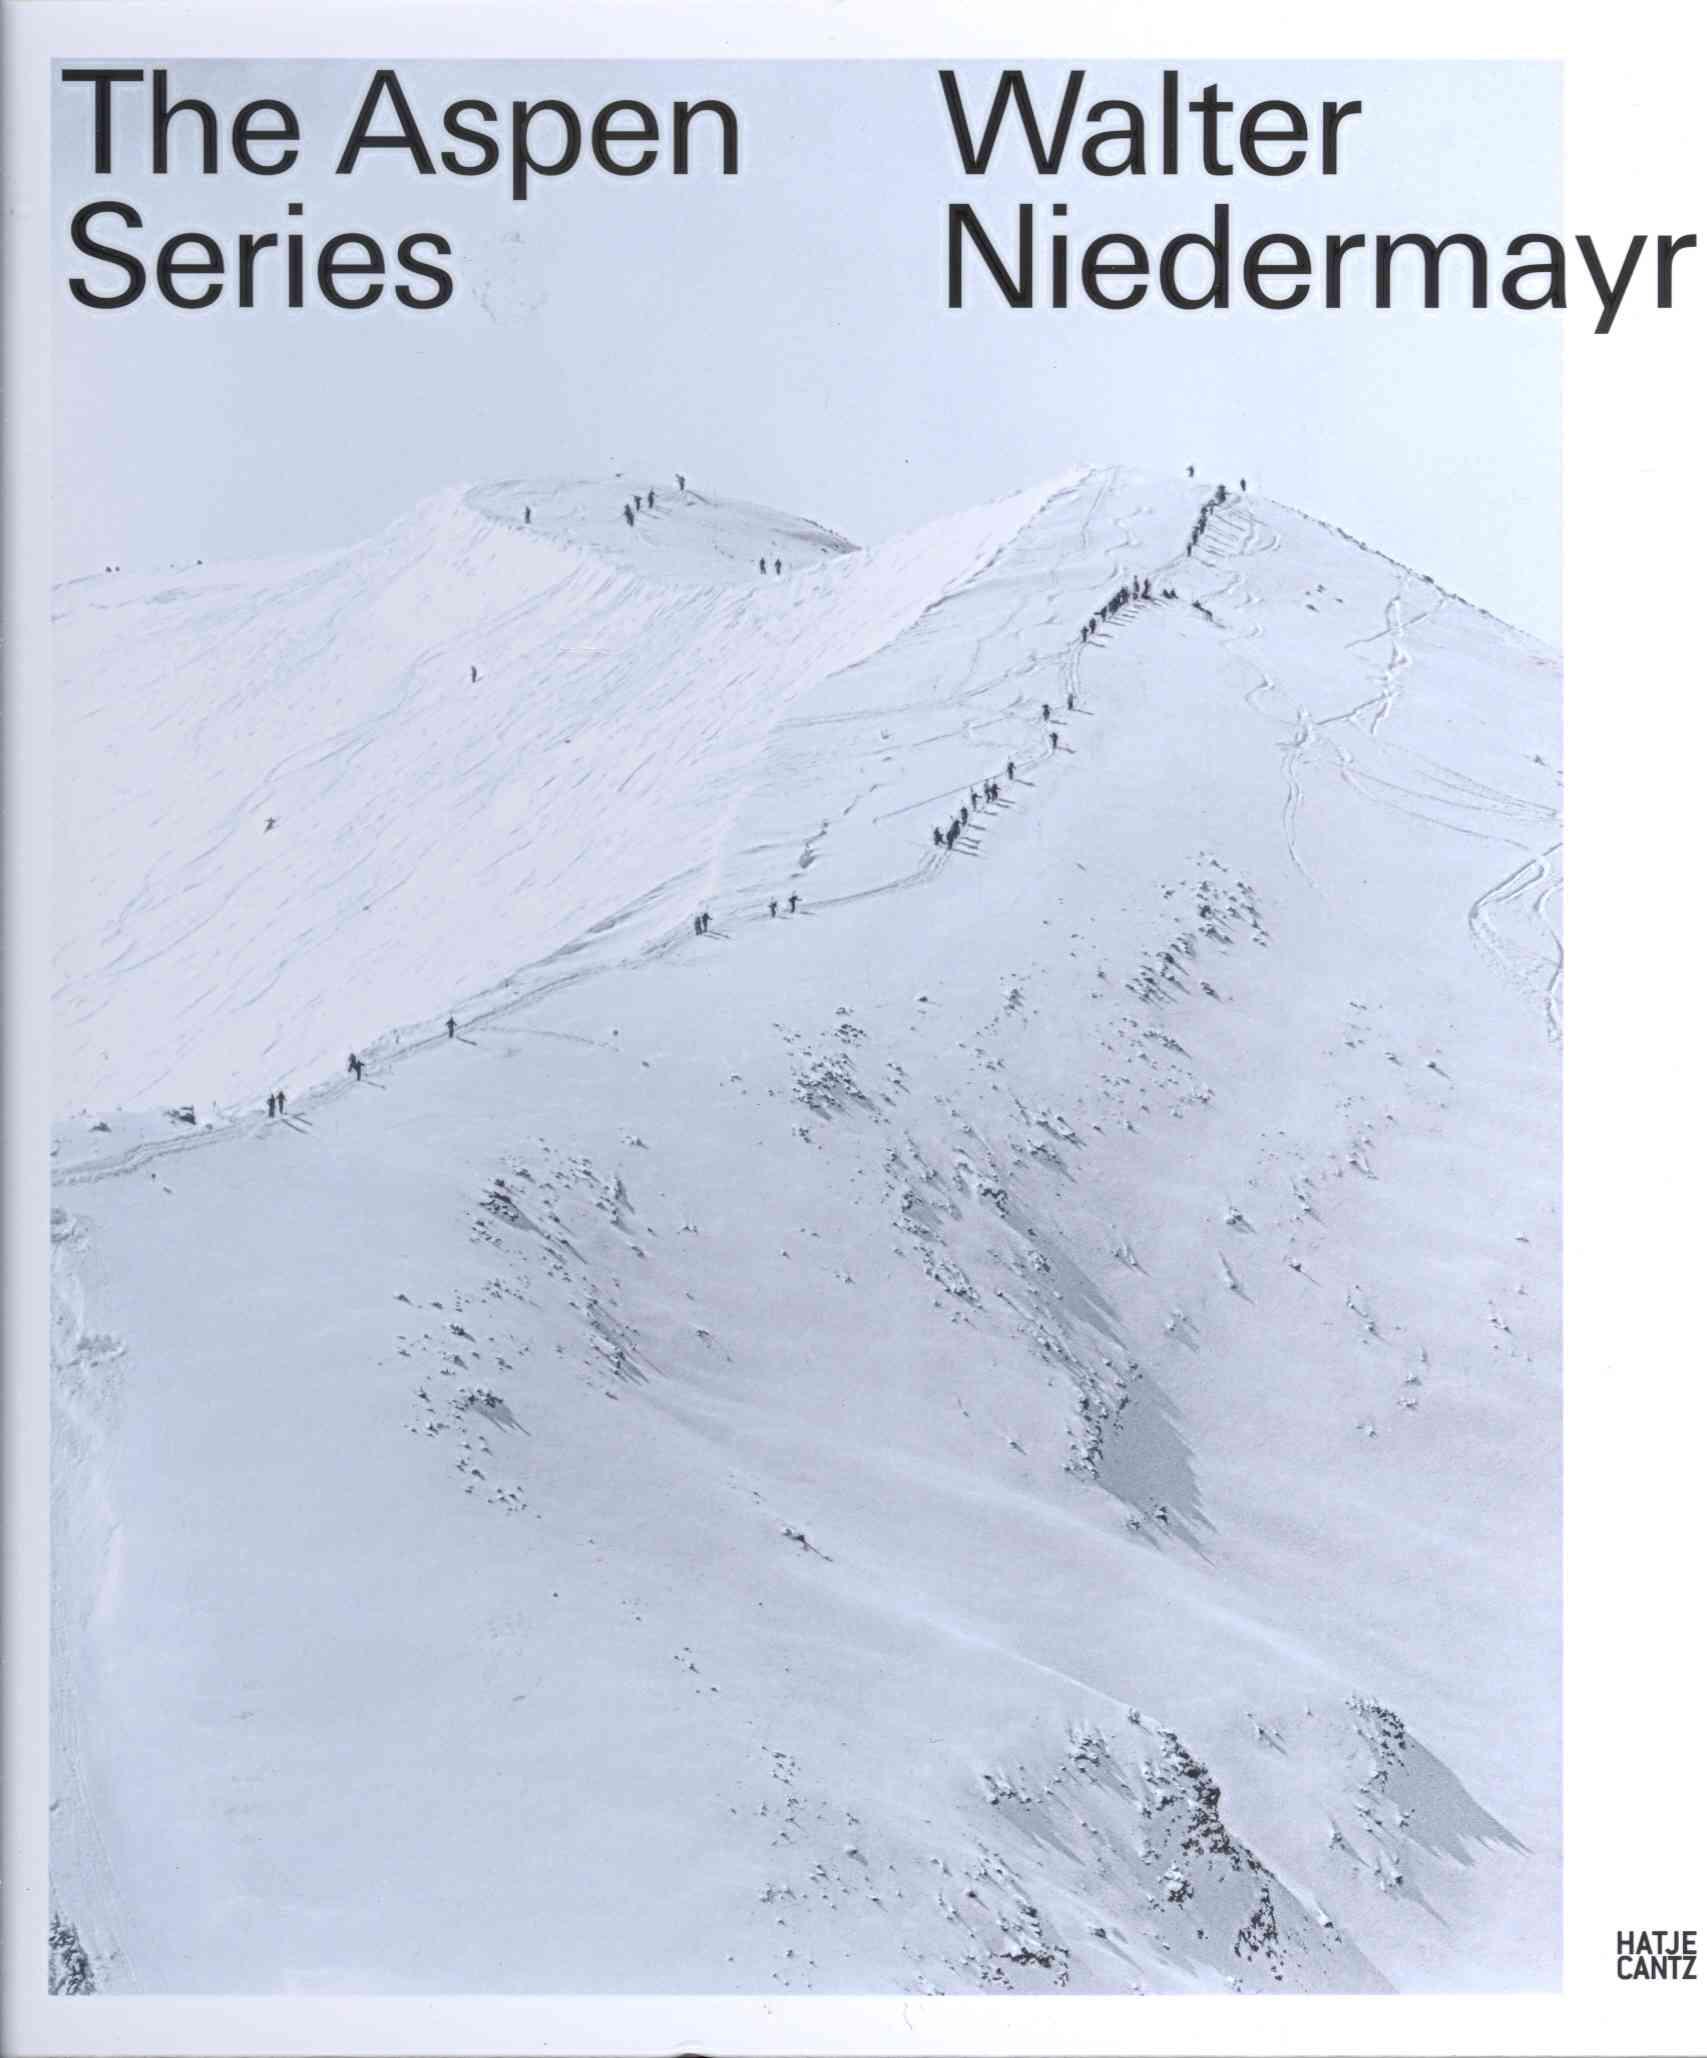 Walter Niedermayr